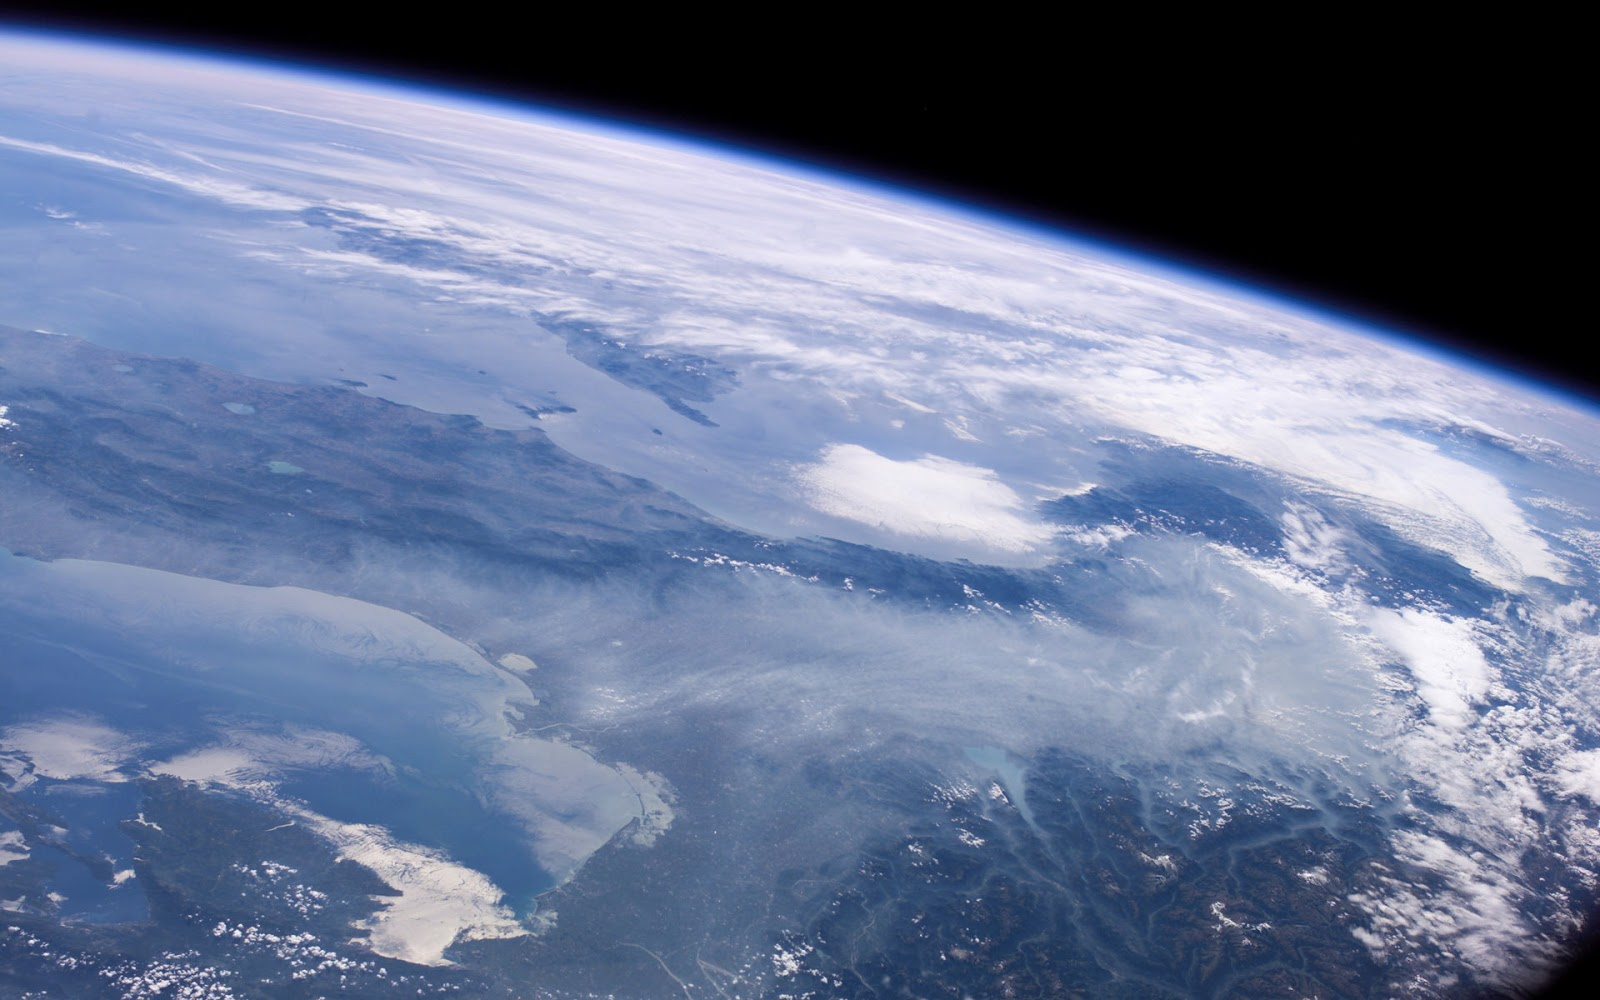 http://1.bp.blogspot.com/-_xc9-xGyhug/UR7tsIpBgtI/AAAAAAAA3AU/cnH7I2wn5g8/s1600/Planeta-Tierra-Desde-el-Espacio_Fondos-de-Pantalla-Universo.jpg